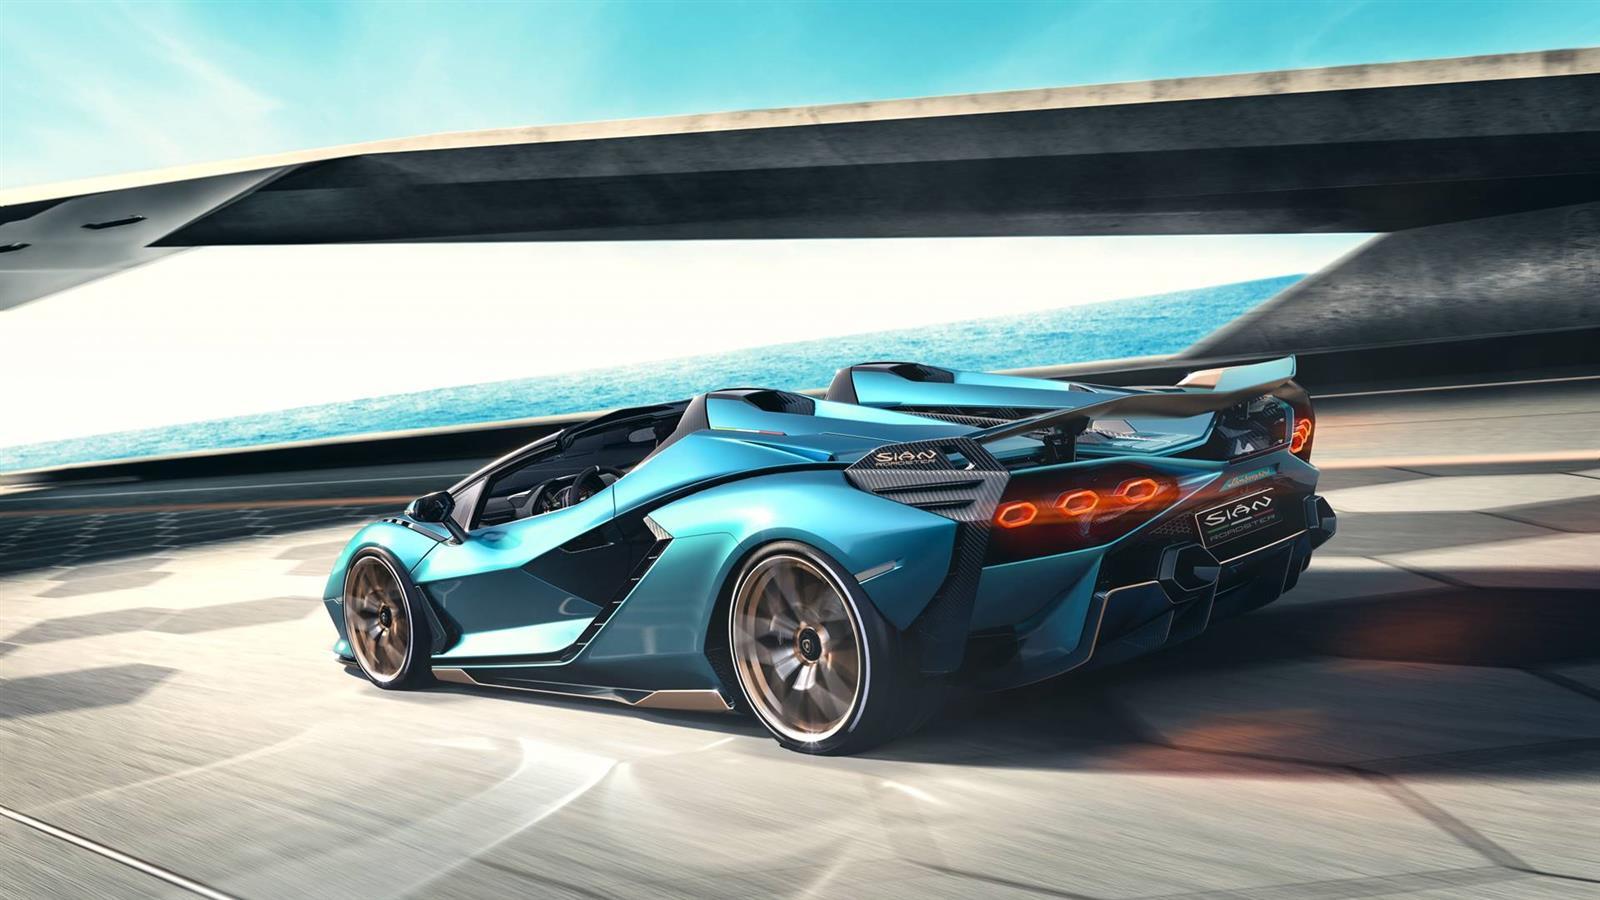 2020 Lamborghini Sián Roadster